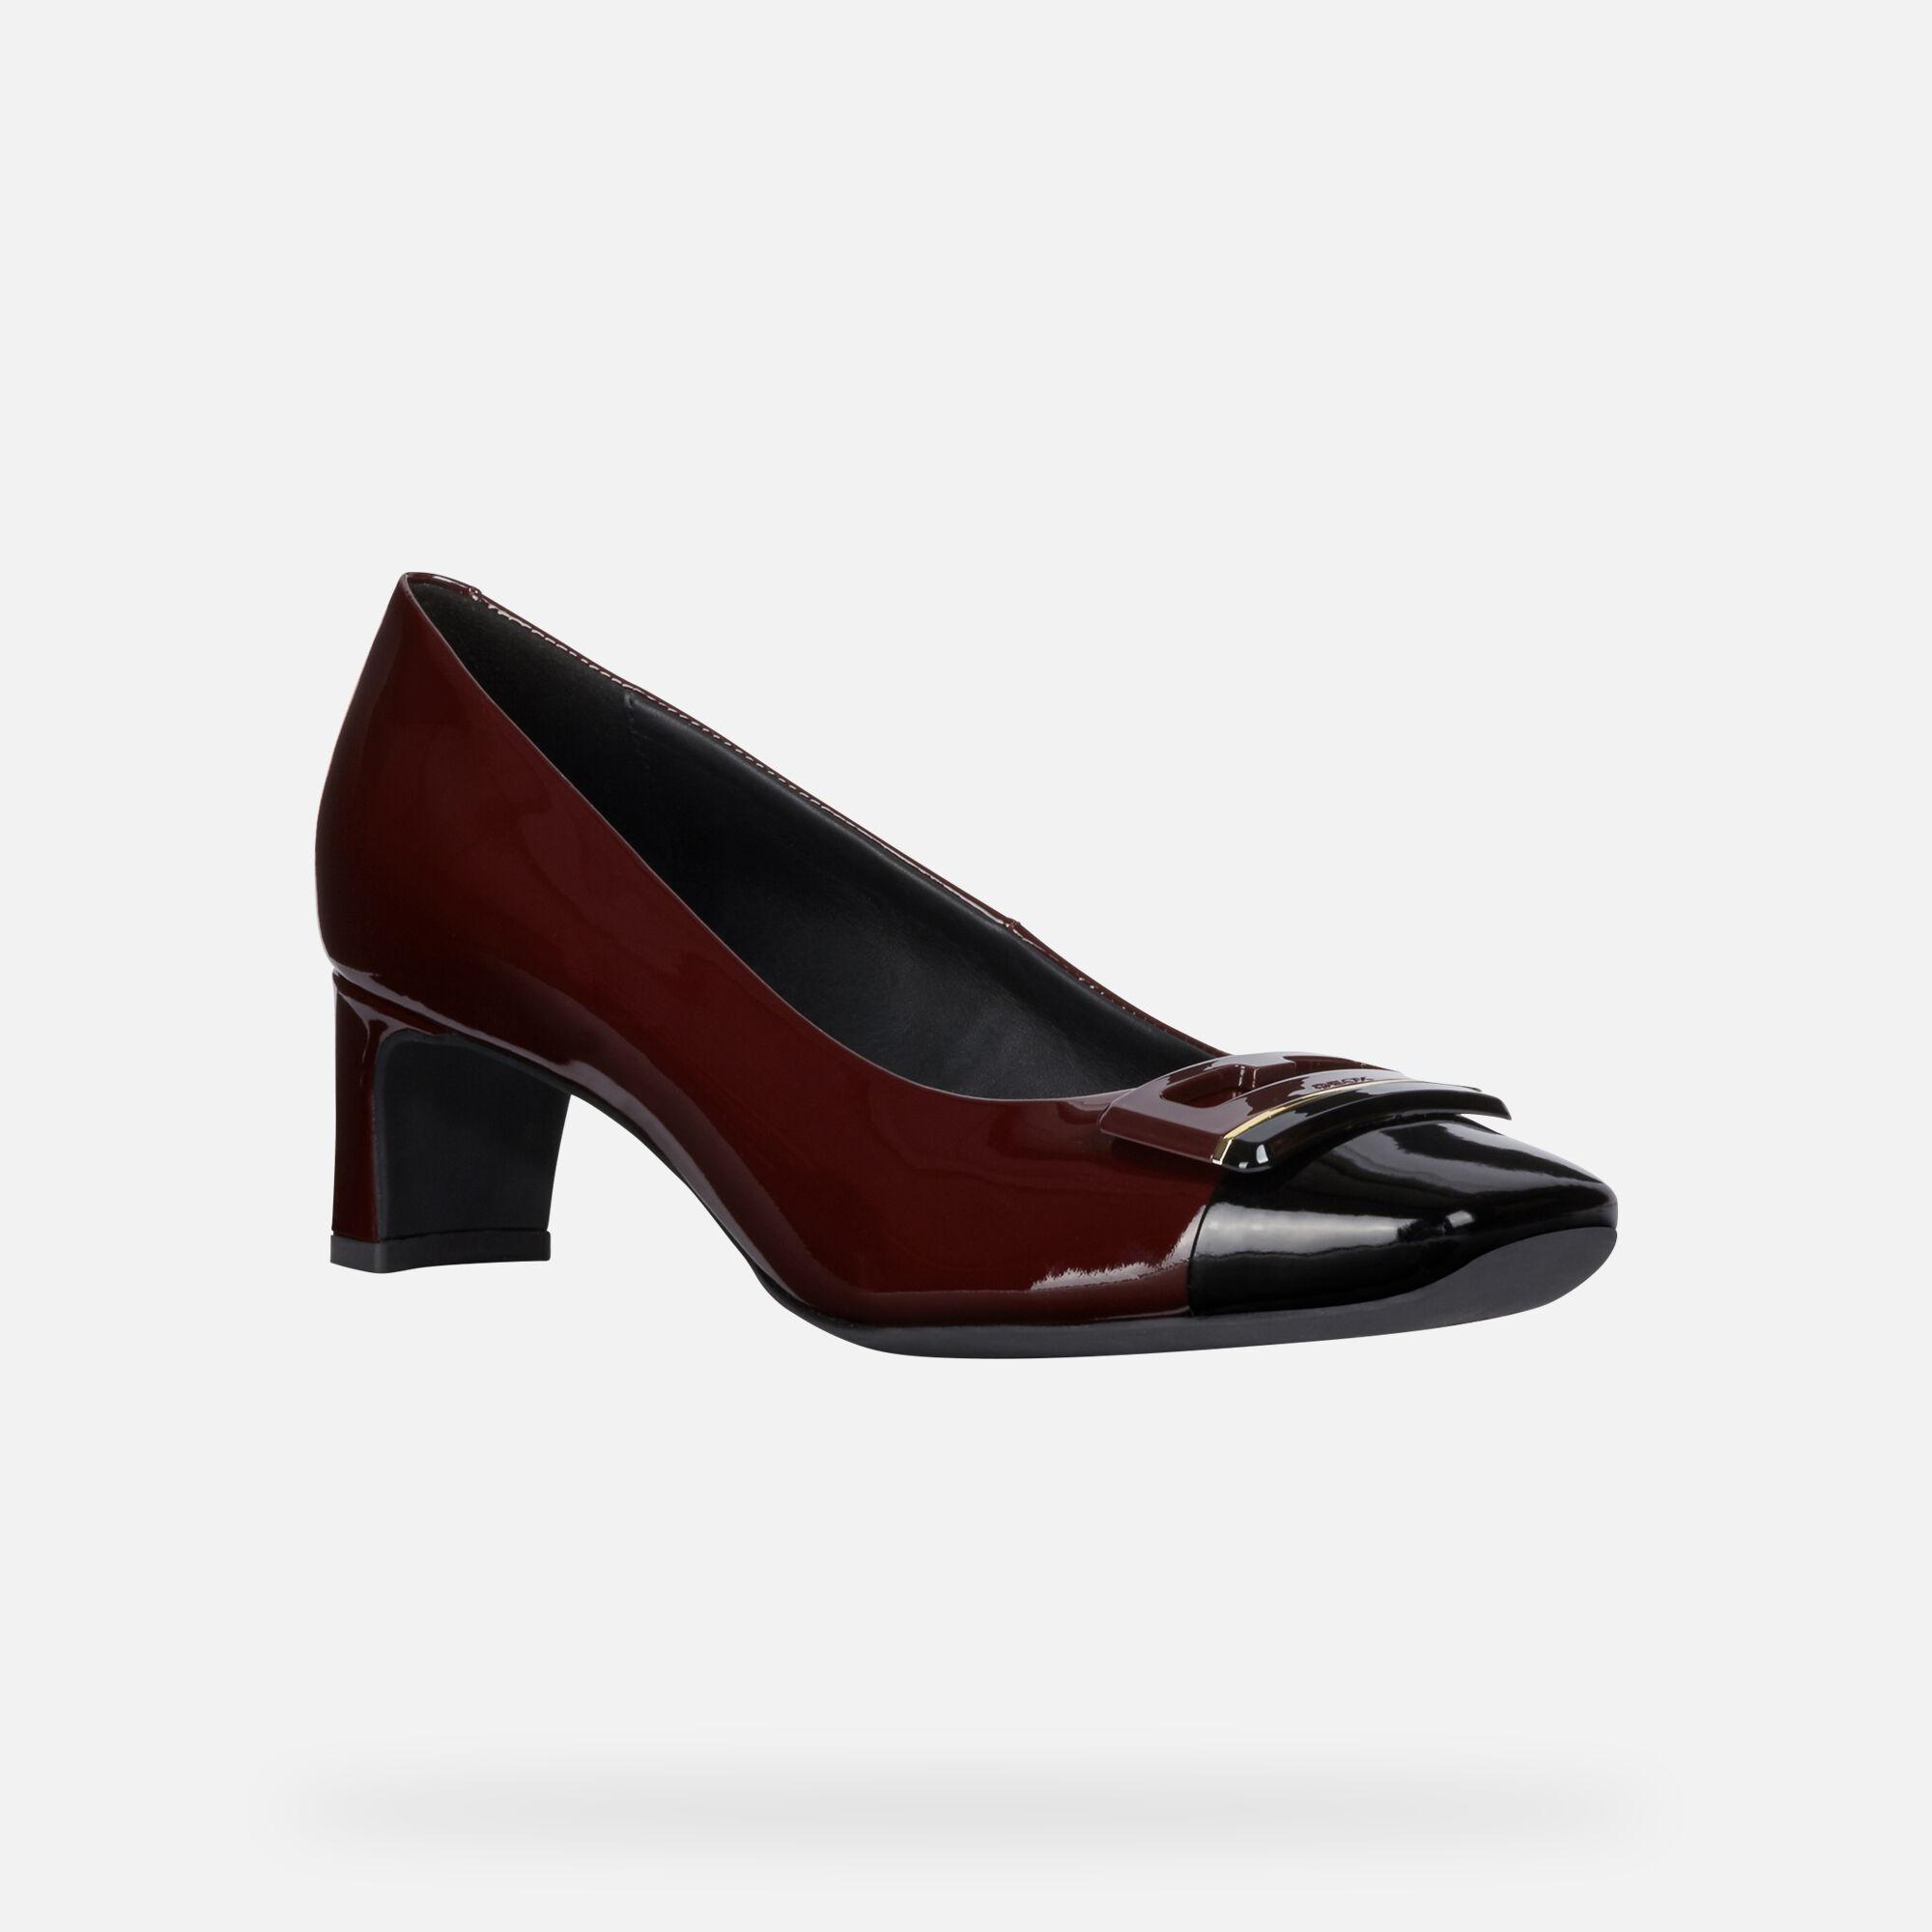 Geox VIVYANNE MID Donna: Scarpe con tacco Bordeaux | Geox ®